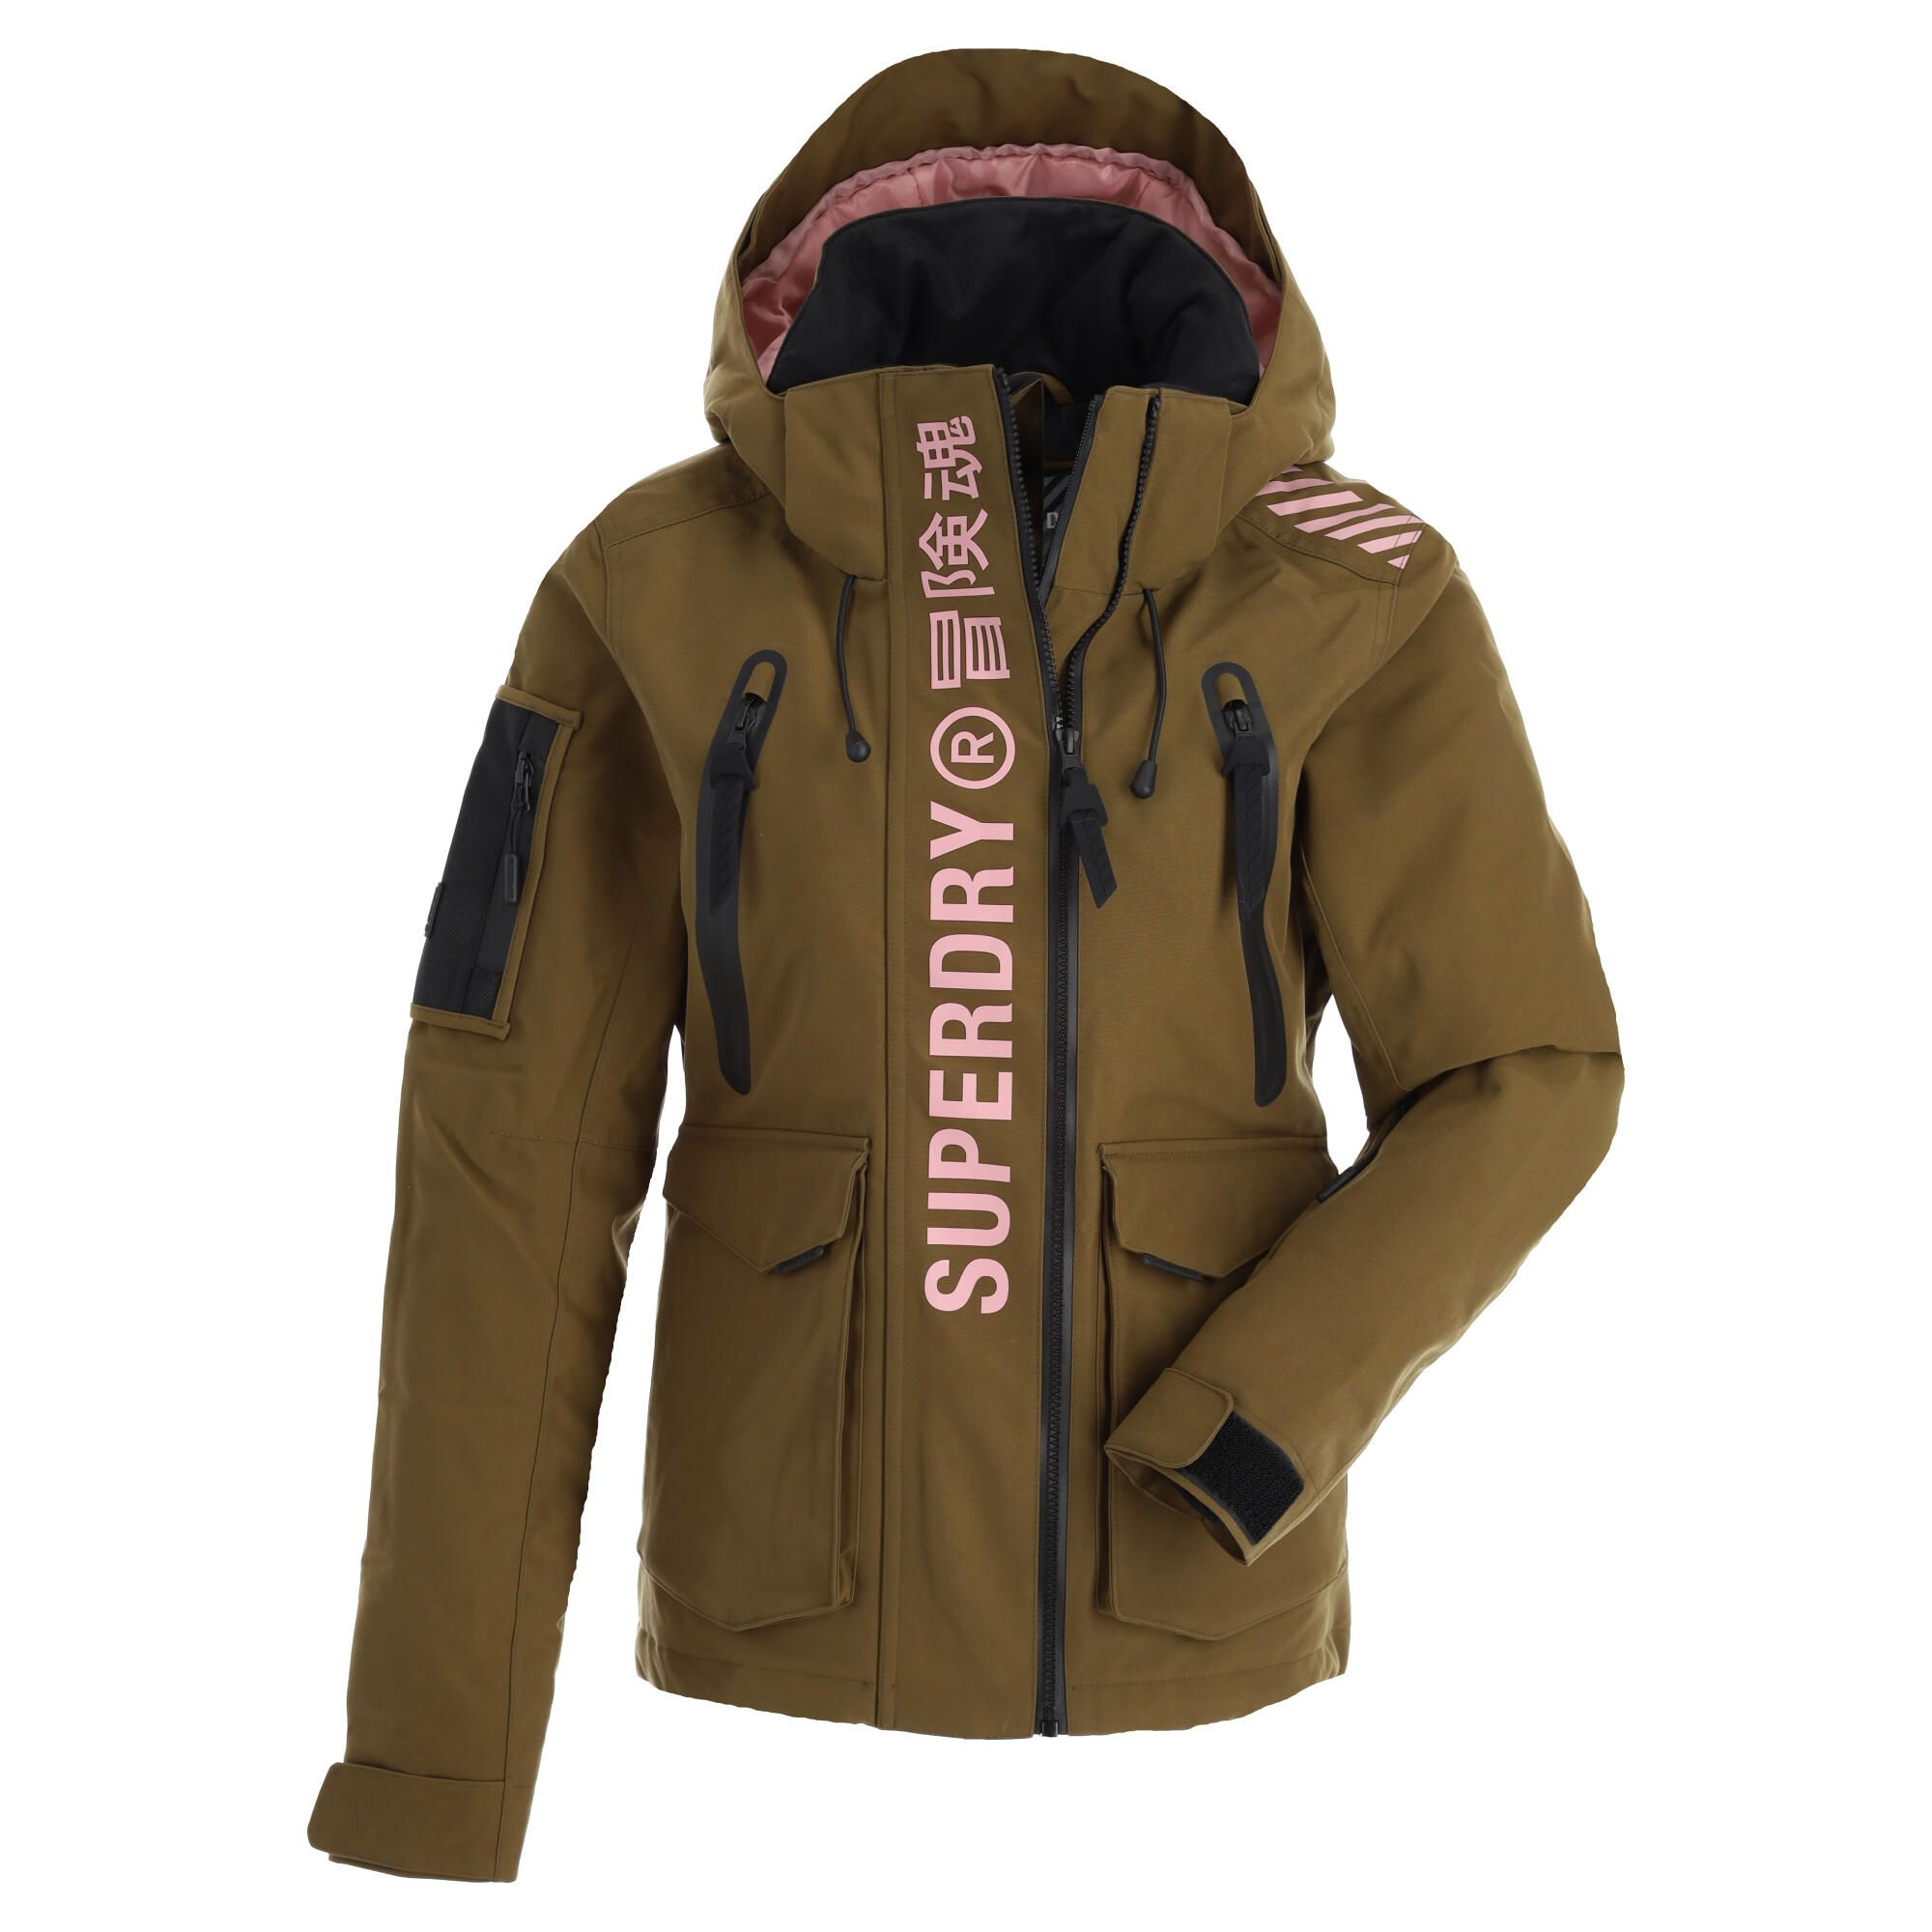 Superdry Ultimate Rescue Jacket Ski Jacket Women Dusty Olive Green Skiwebshopskiwebshop Com